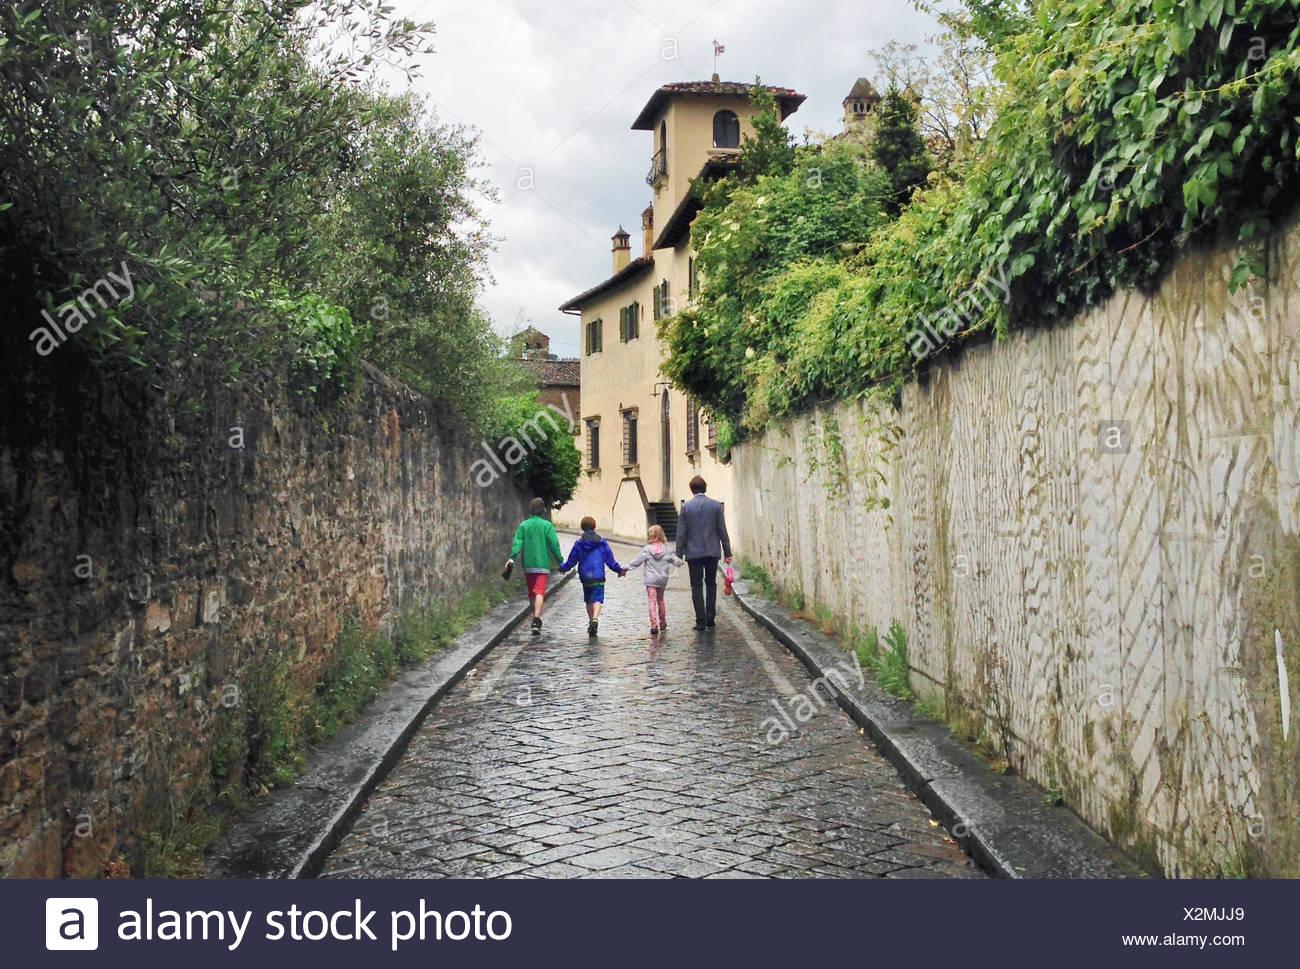 Italien, Toskana, Florenz, Vater mit drei Kindern (10-11, 12-13) walking an regnerischen Tag Stockbild